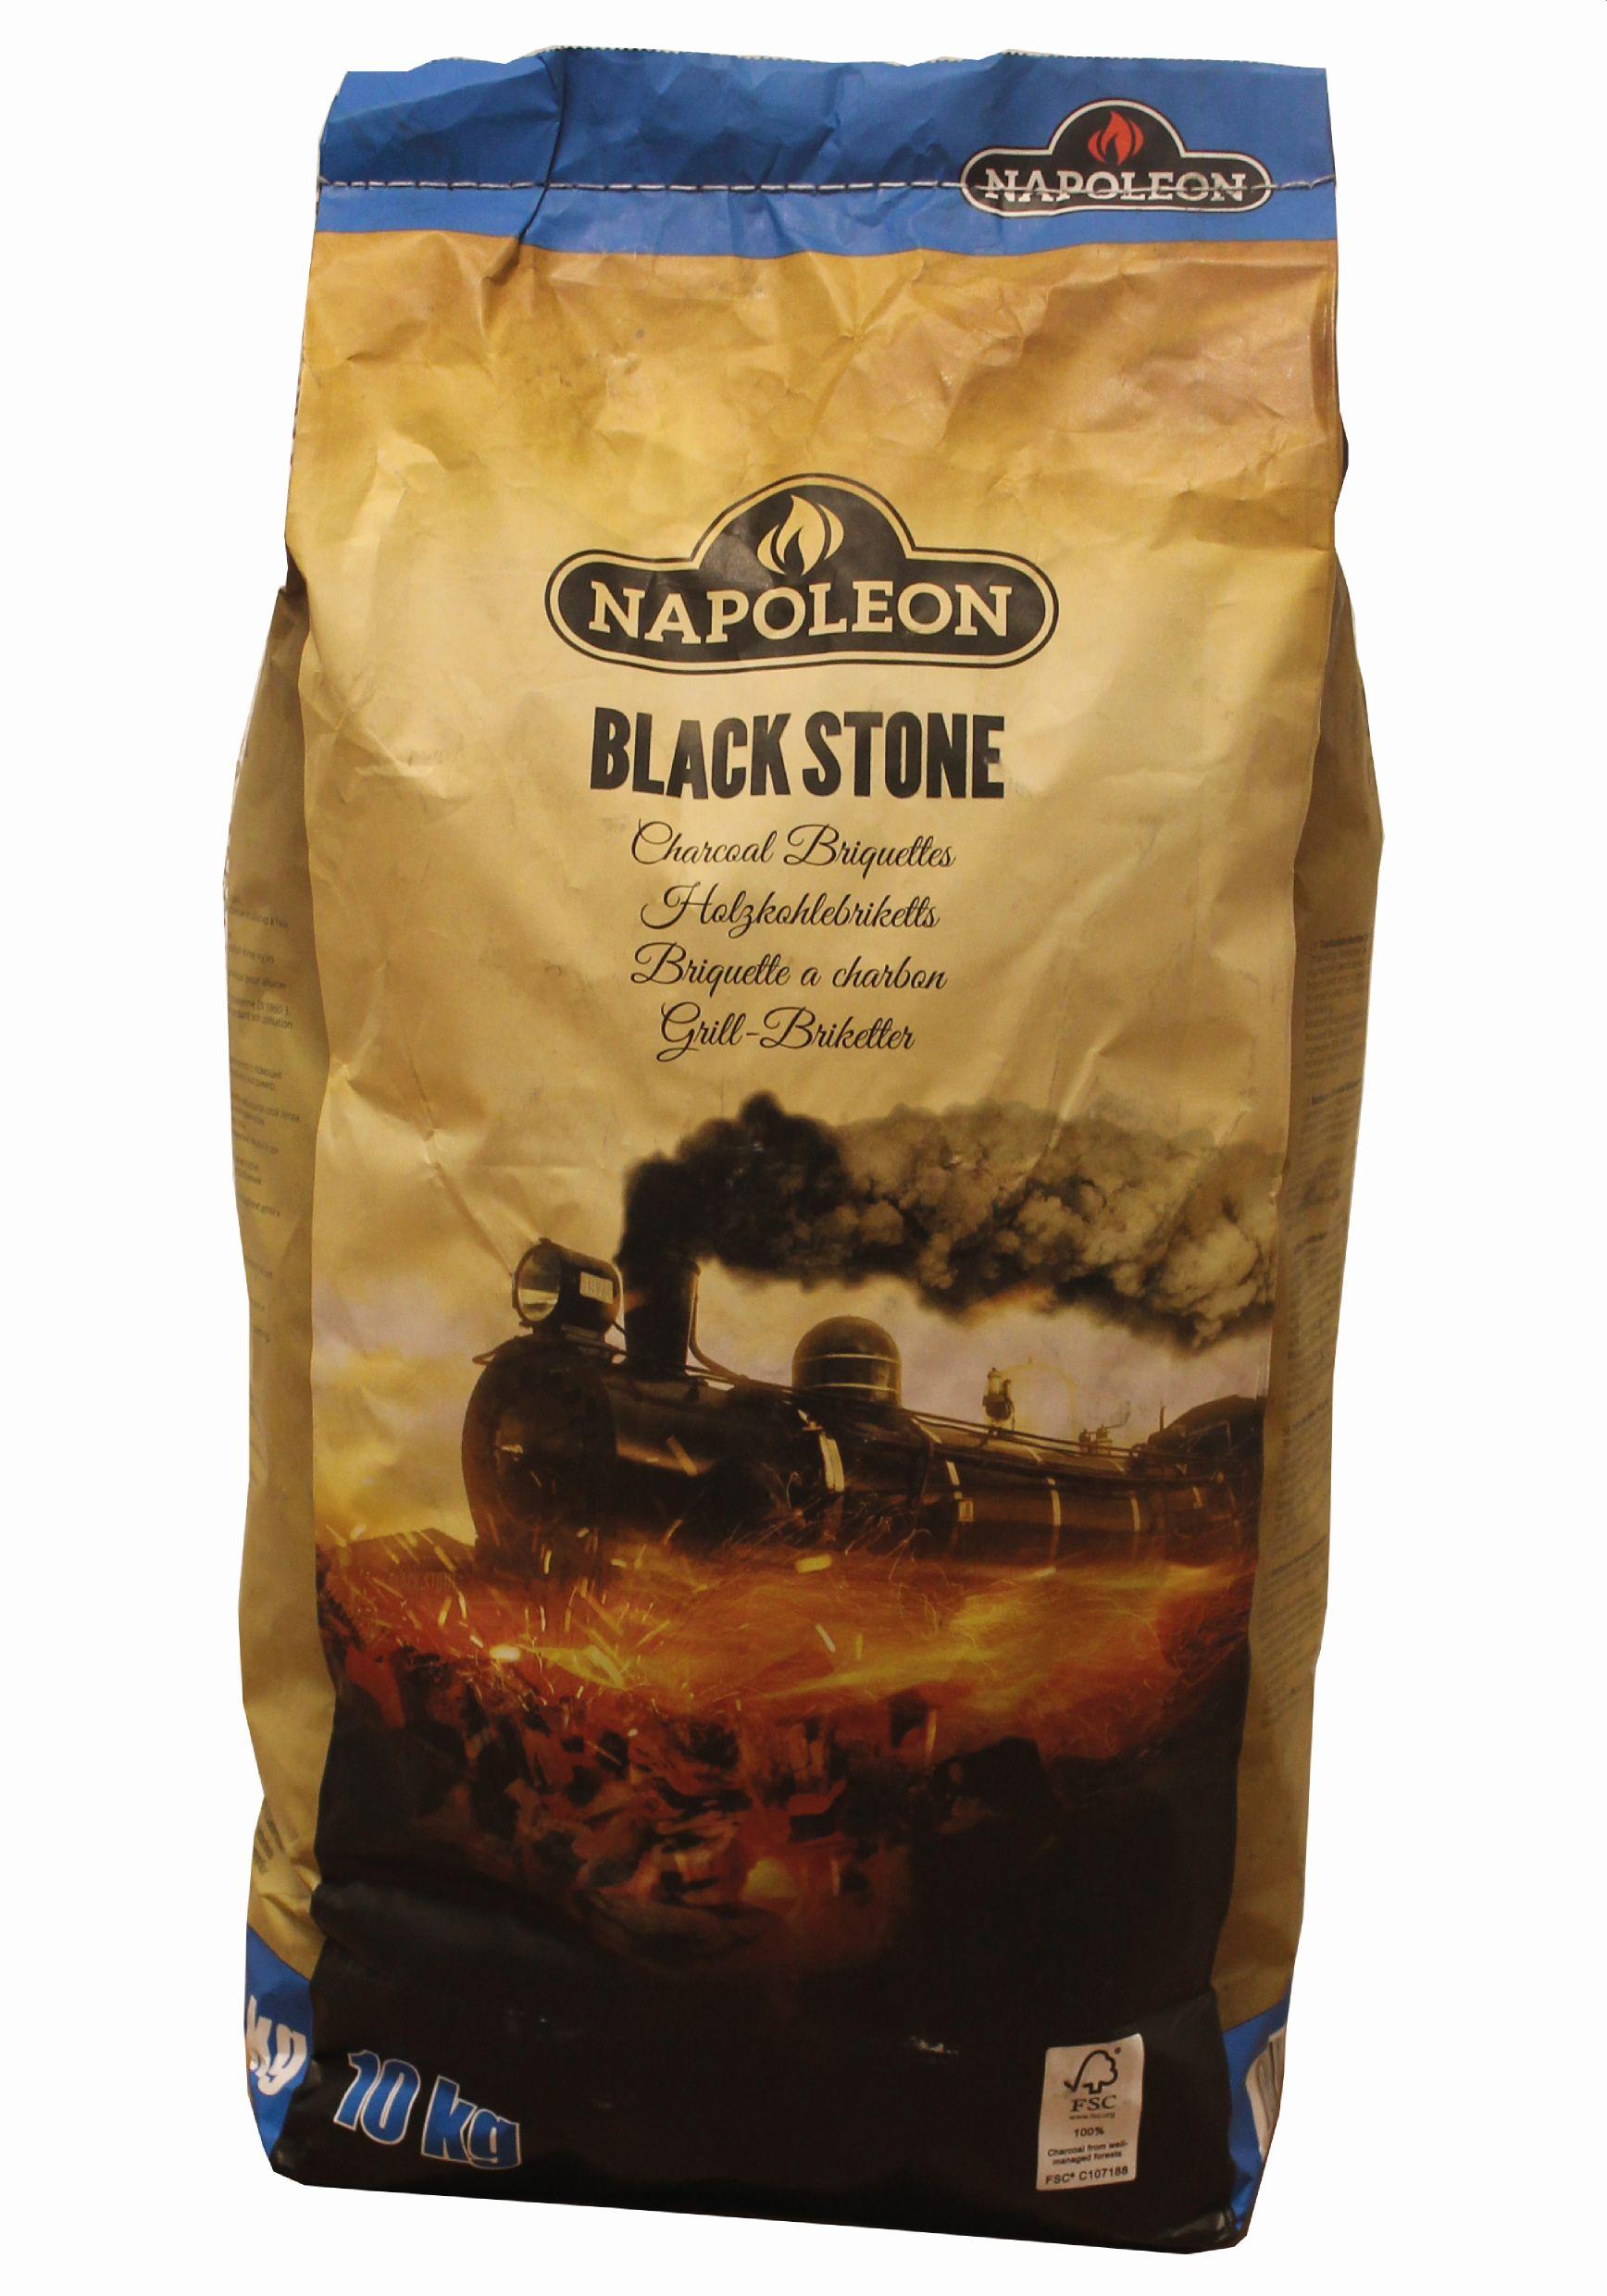 Napoleon blackstone Grillbriketten 10kg